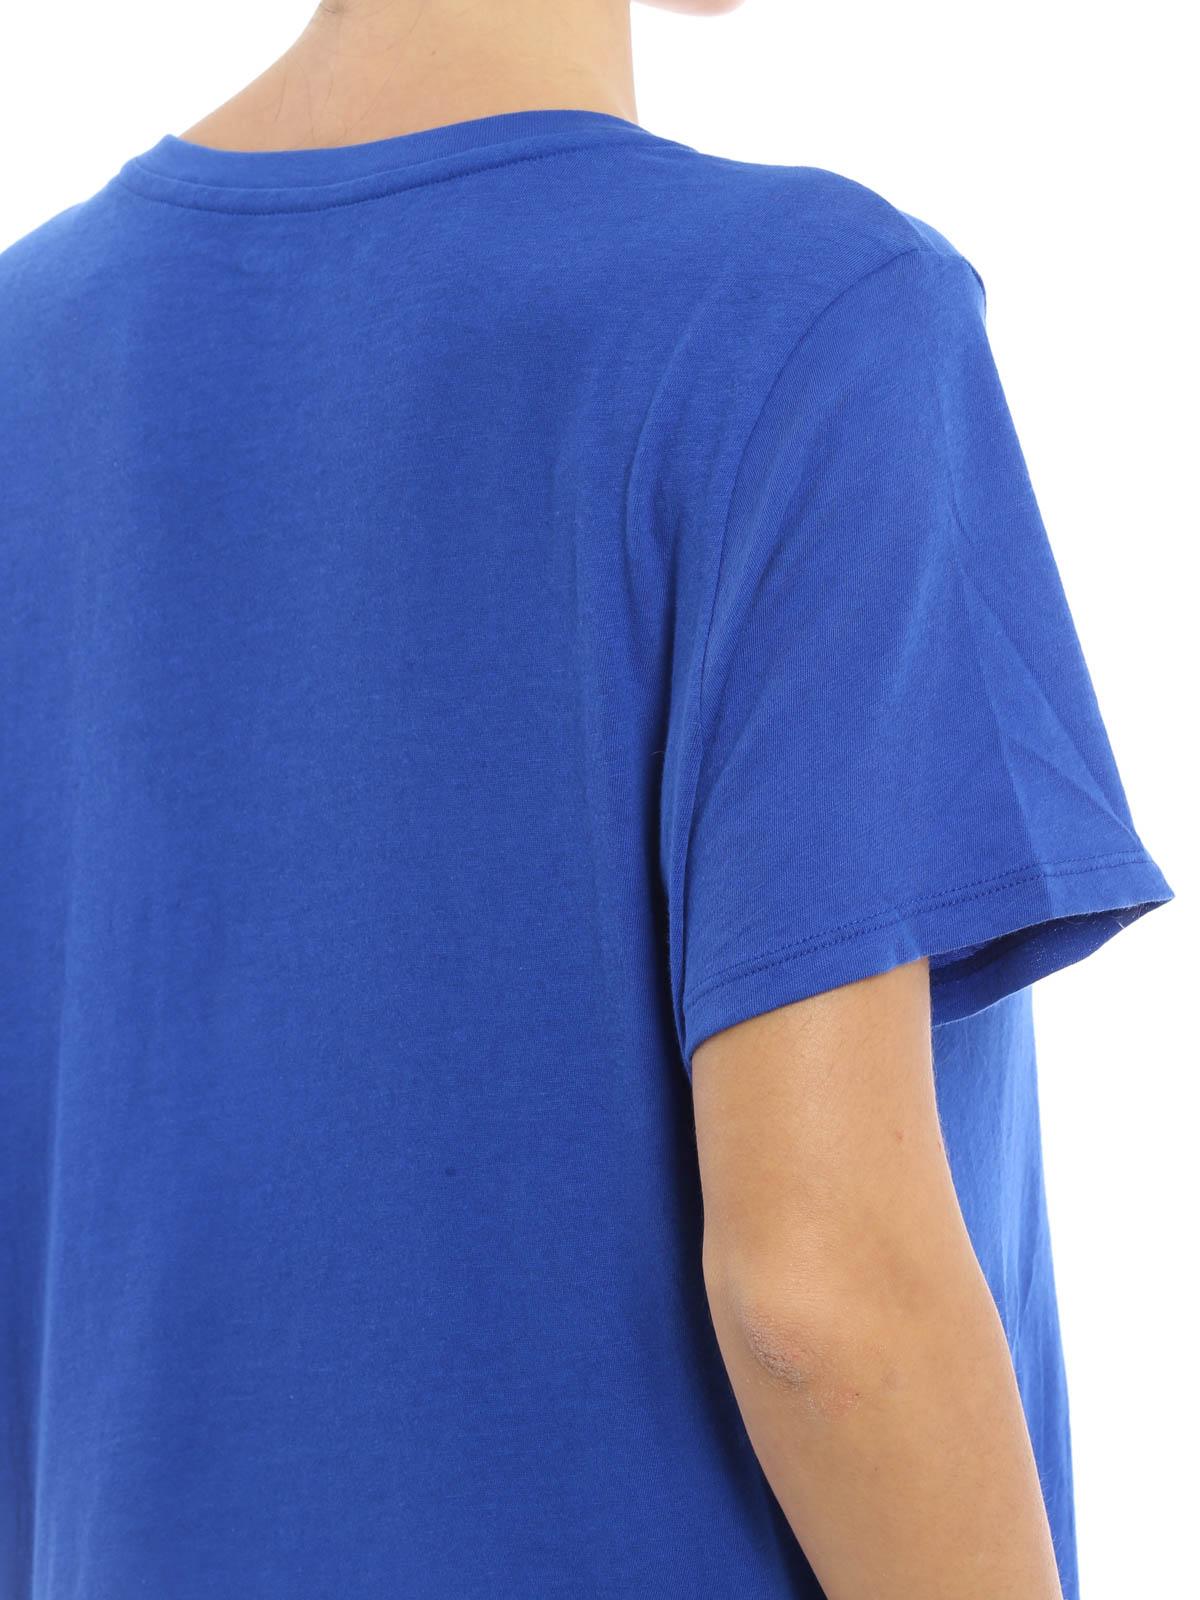 T shirt con logo goffrato polo ralph lauren t shirt for V neck t shirt online shopping